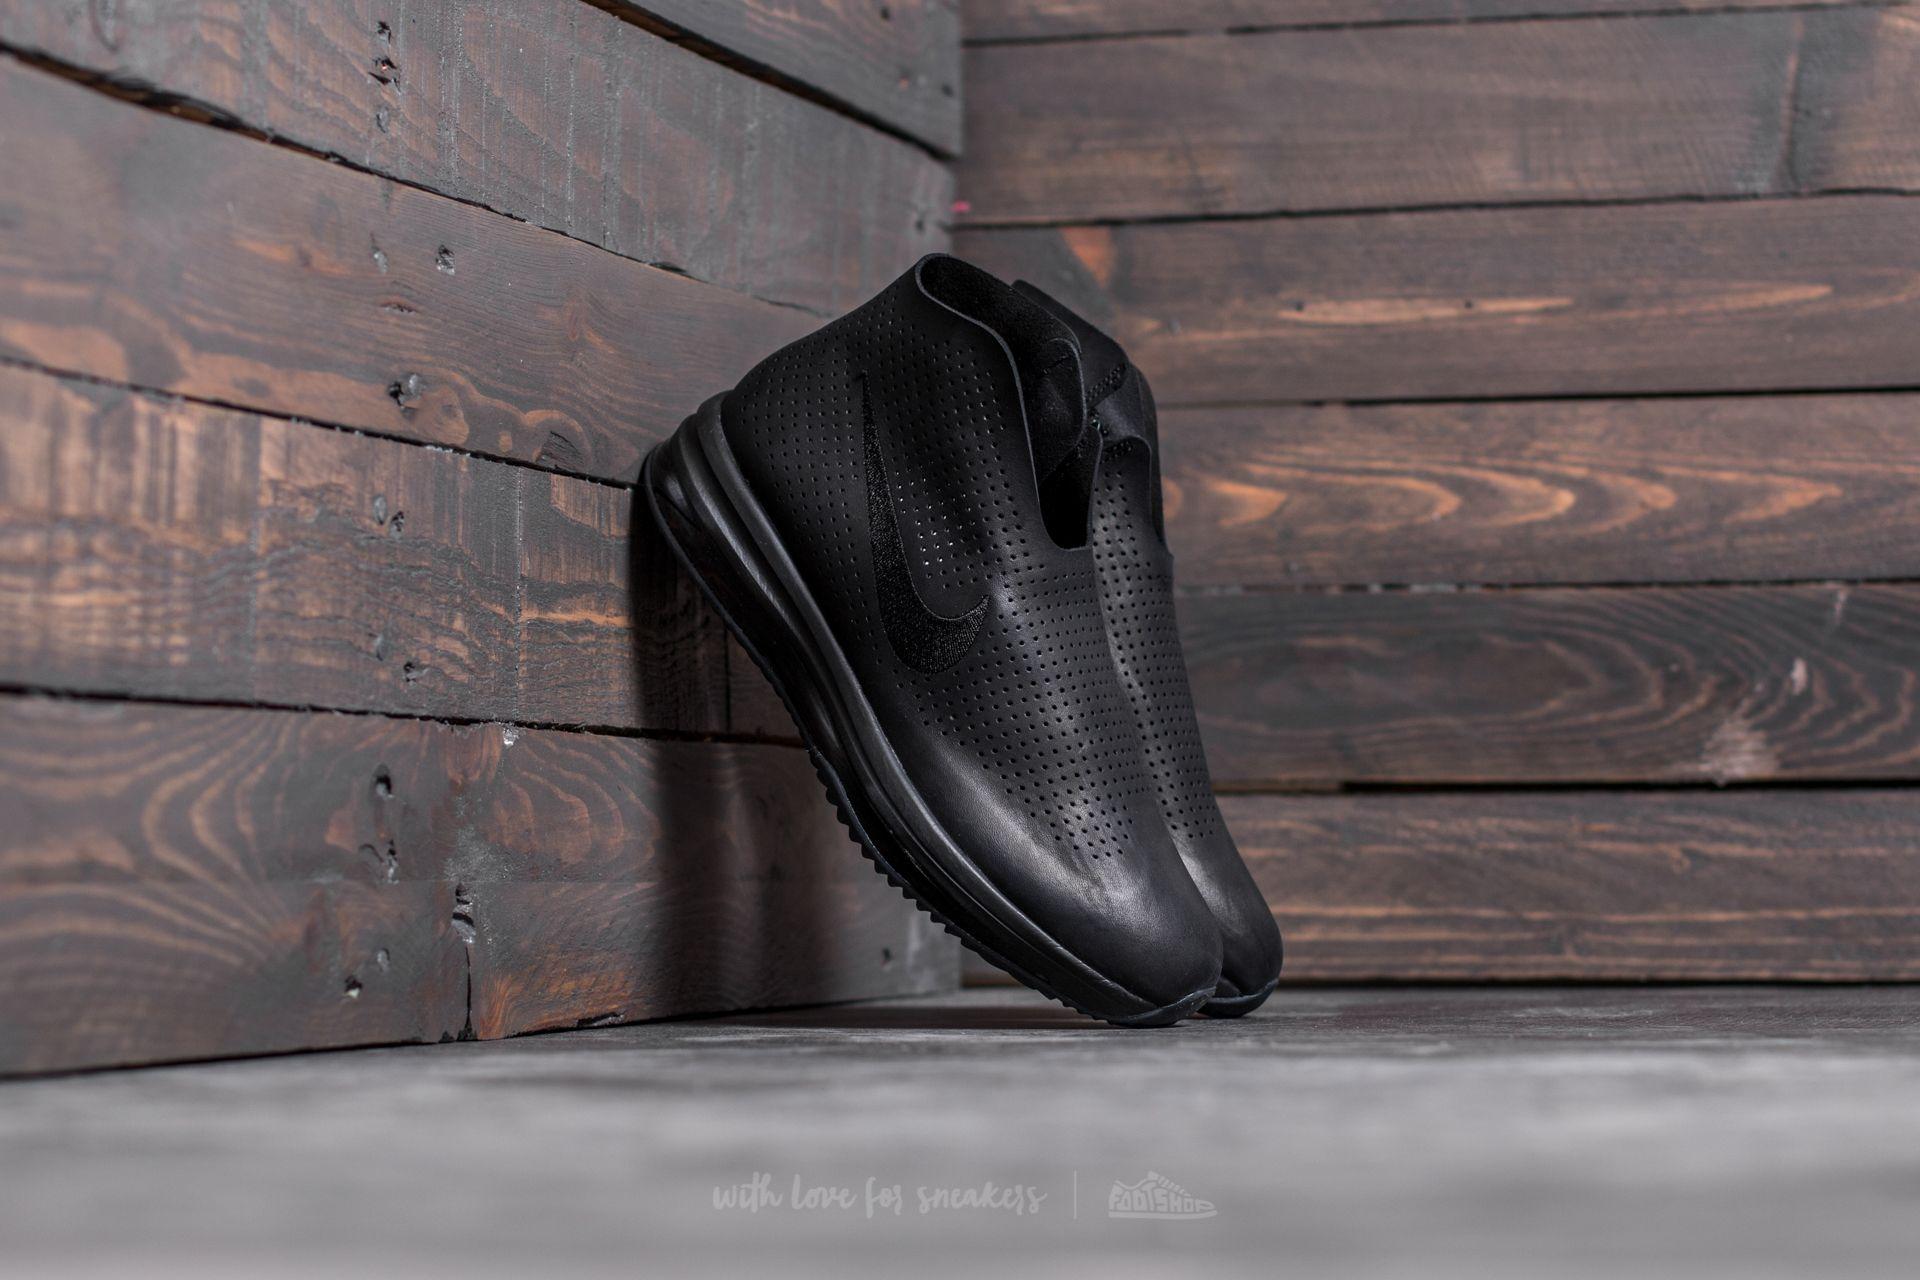 fe8f43426823 Nike W Zoom Modairna Black  Black-Anthracite